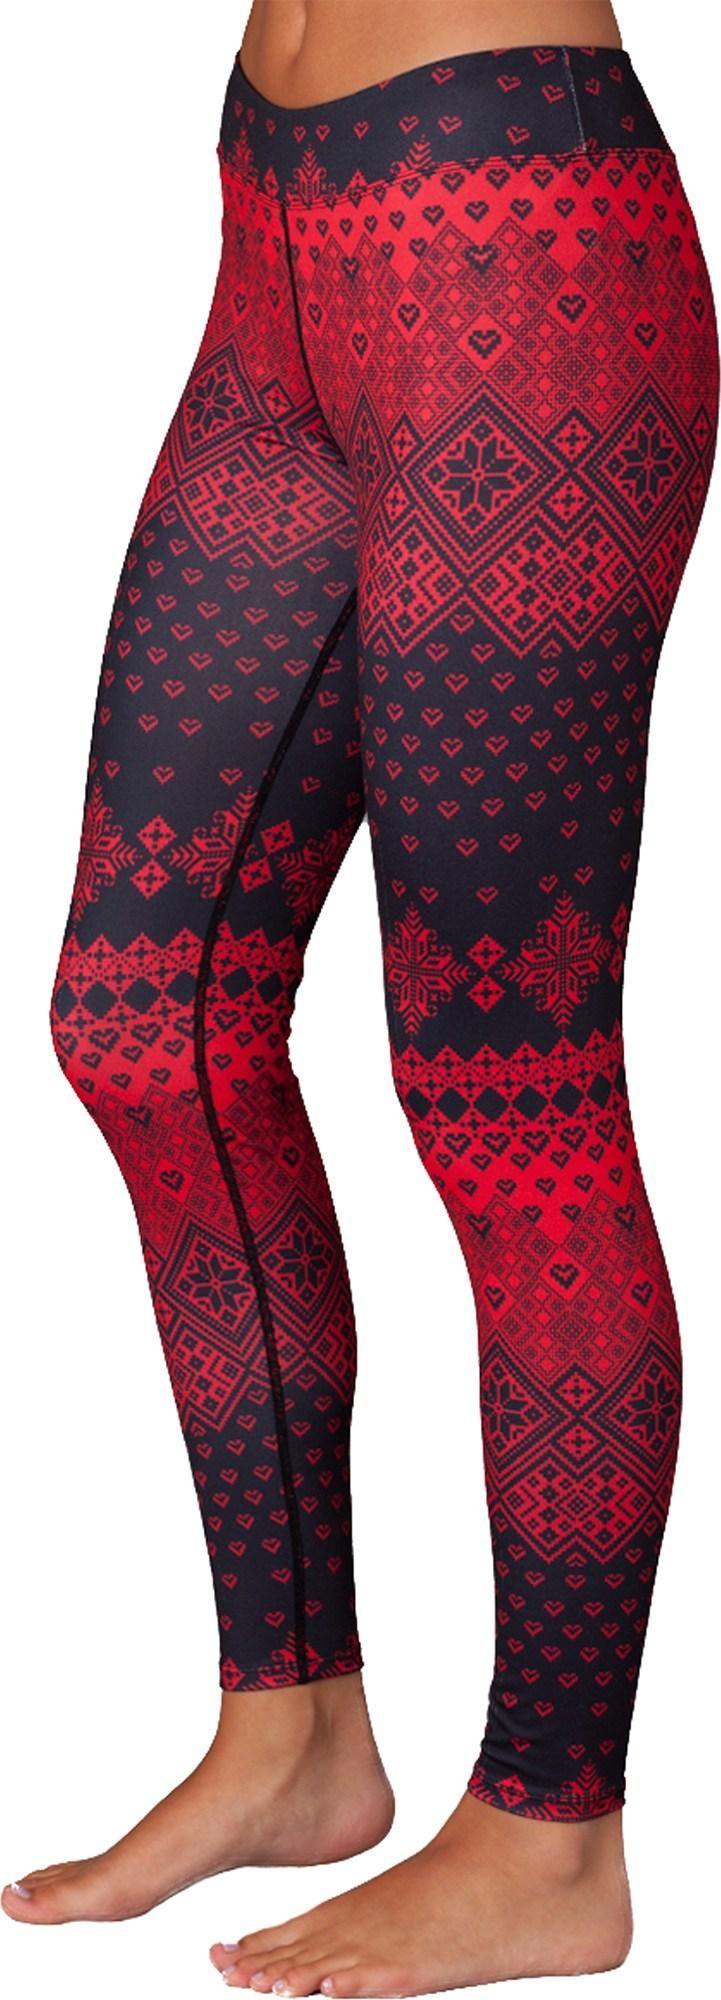 ski long underwear